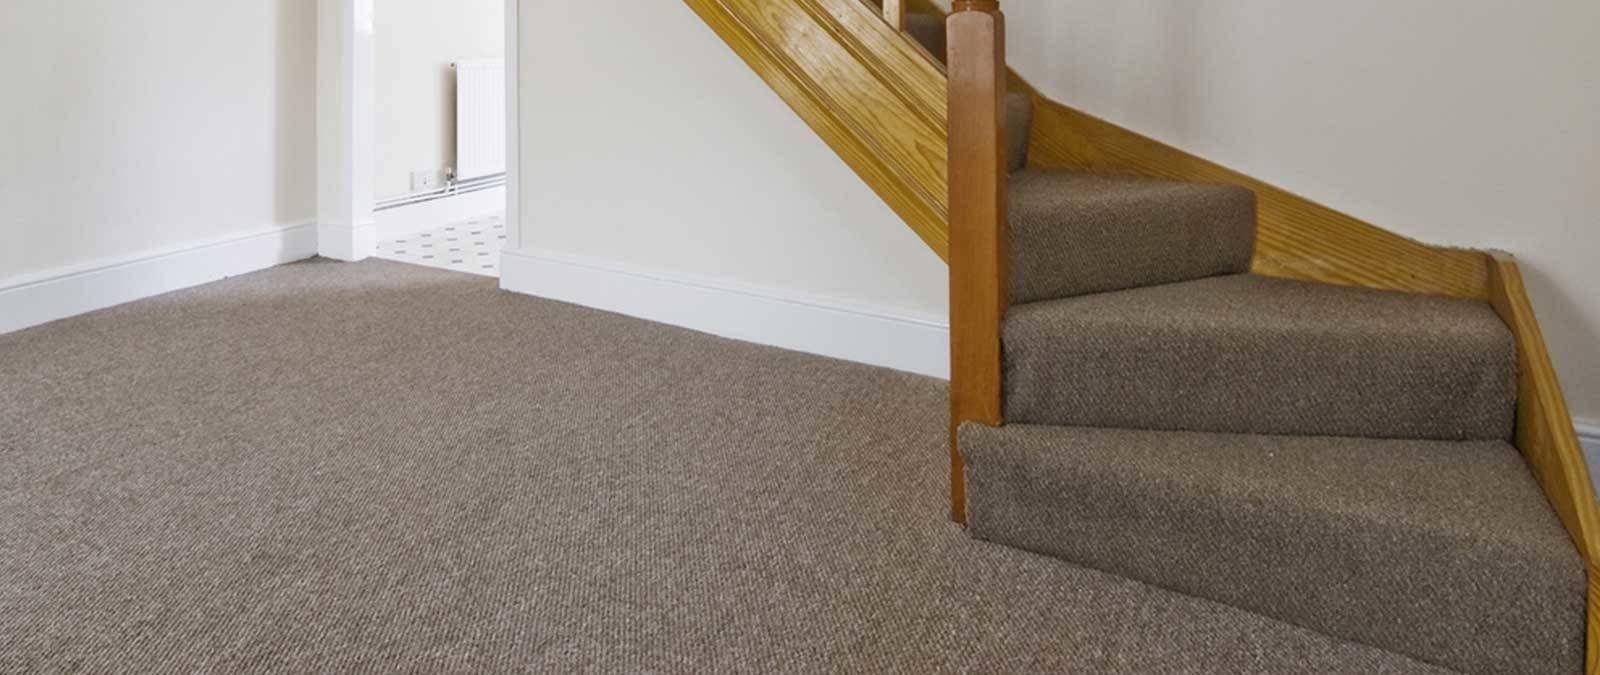 New Living Room Stairs Carpet Anglia Store Bury - Homes DIY